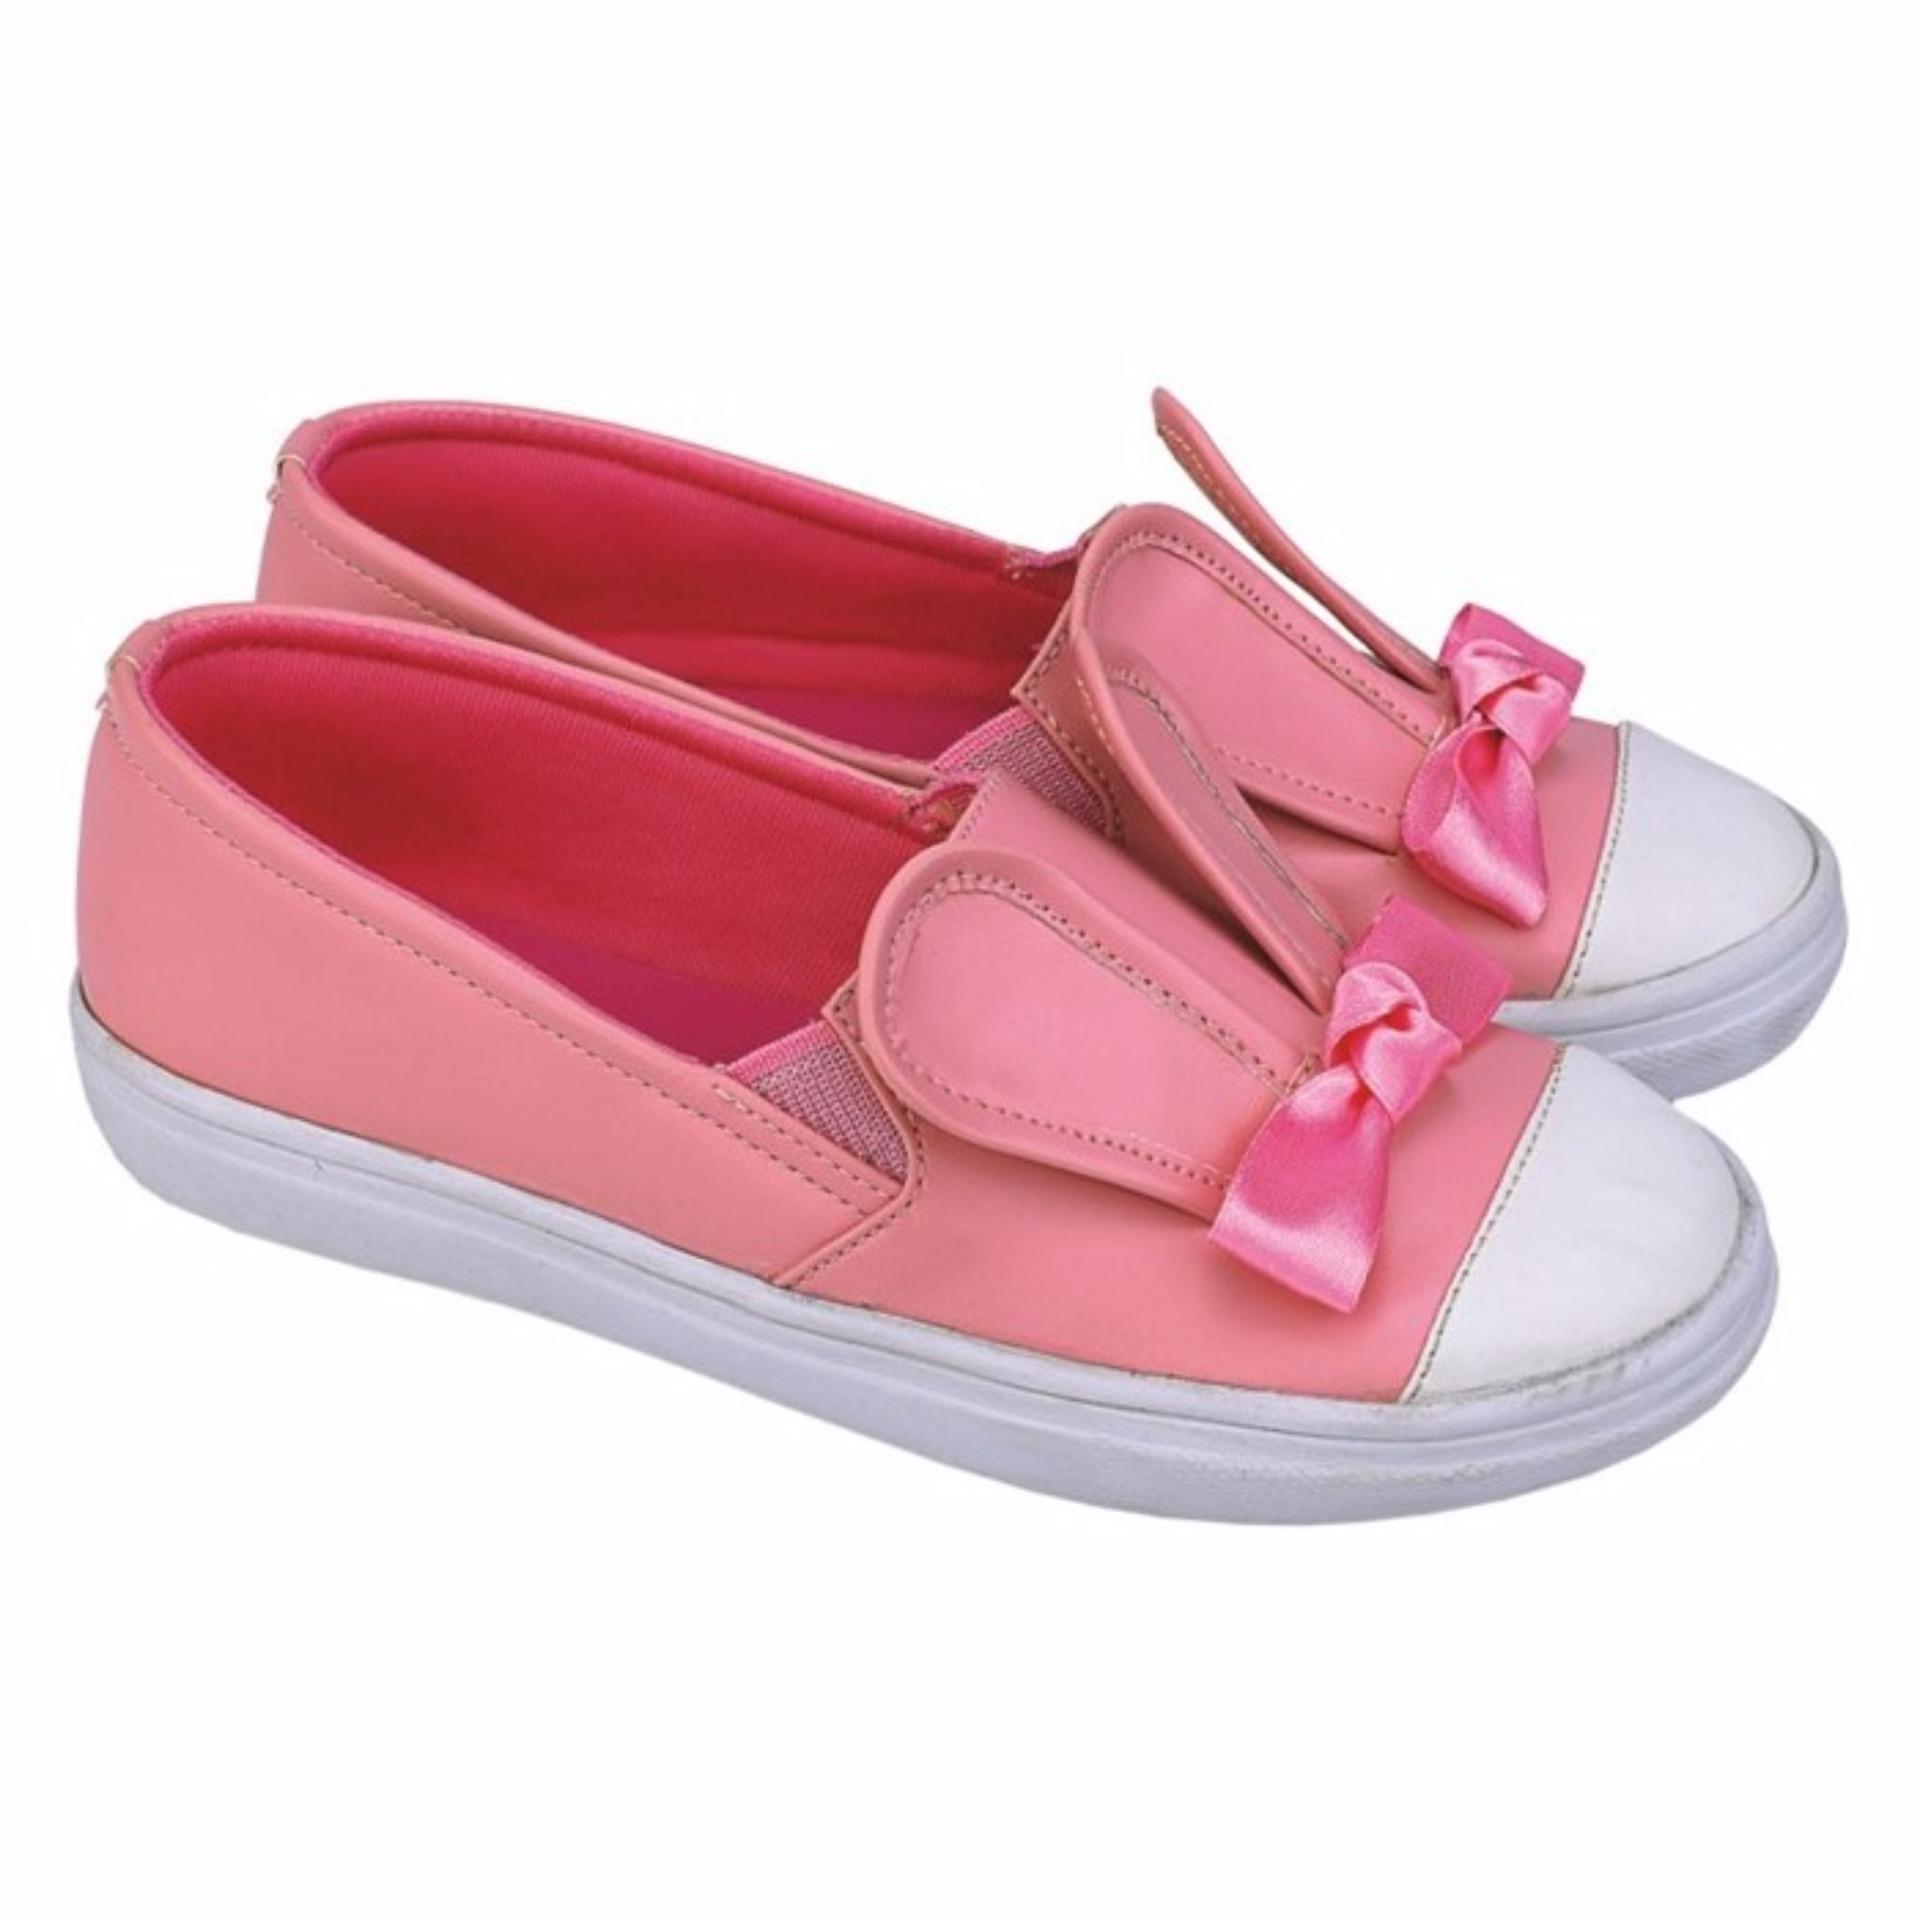 CTZ Jr Sepatu casual anak Perempuan / sepatu slip on anak Perempuan CRL 066 Pink